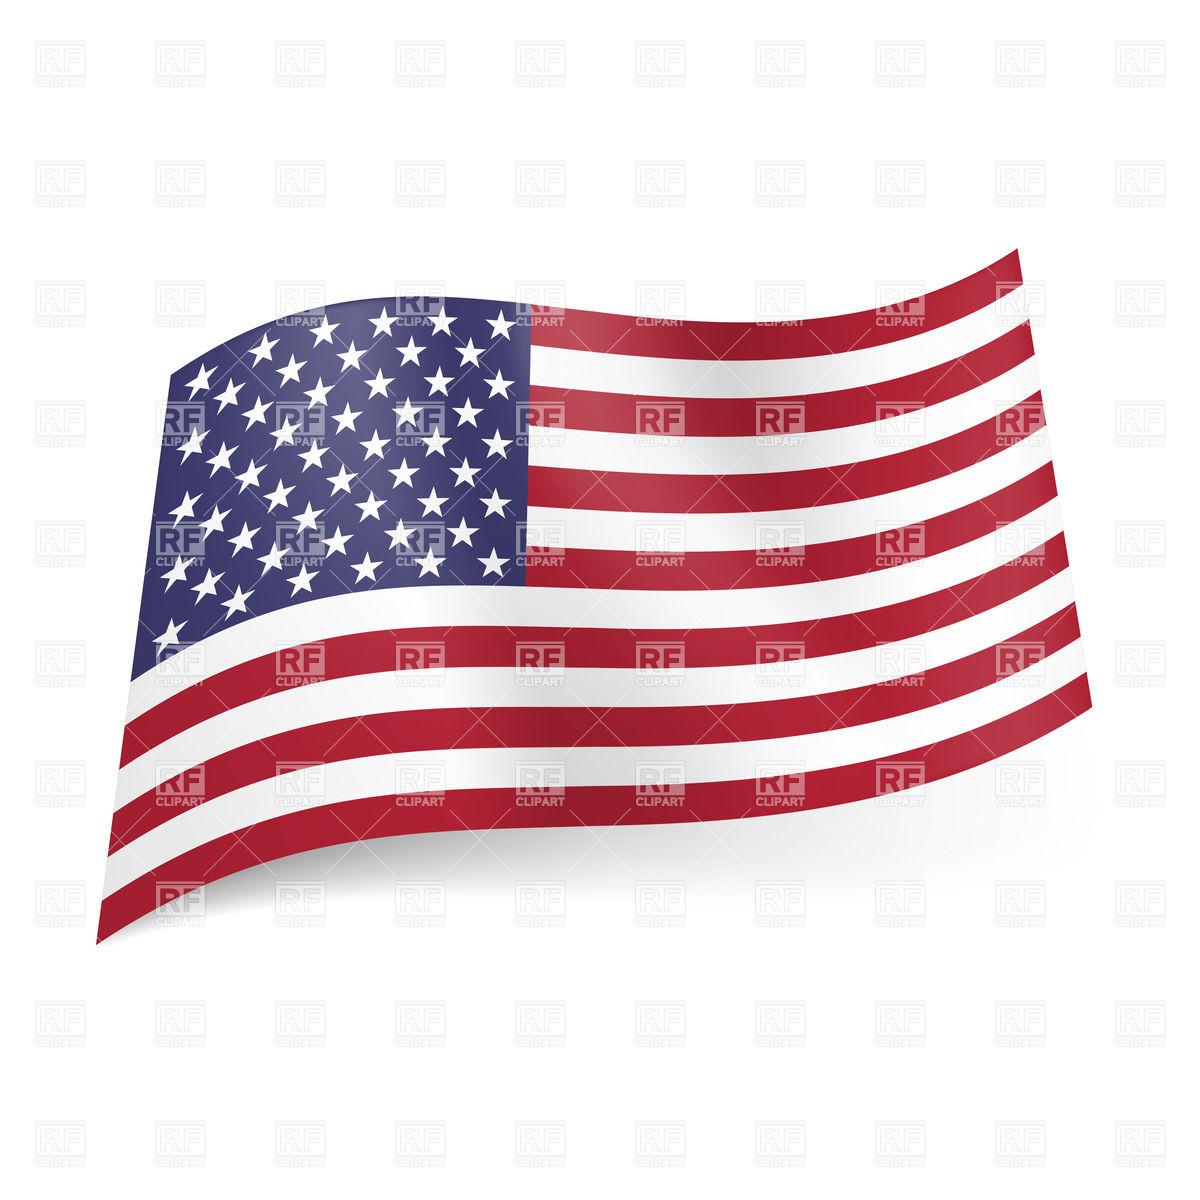 1200x1200 Us Flag Clipart Fresh Waving American Stars And Stripes Usa Flag